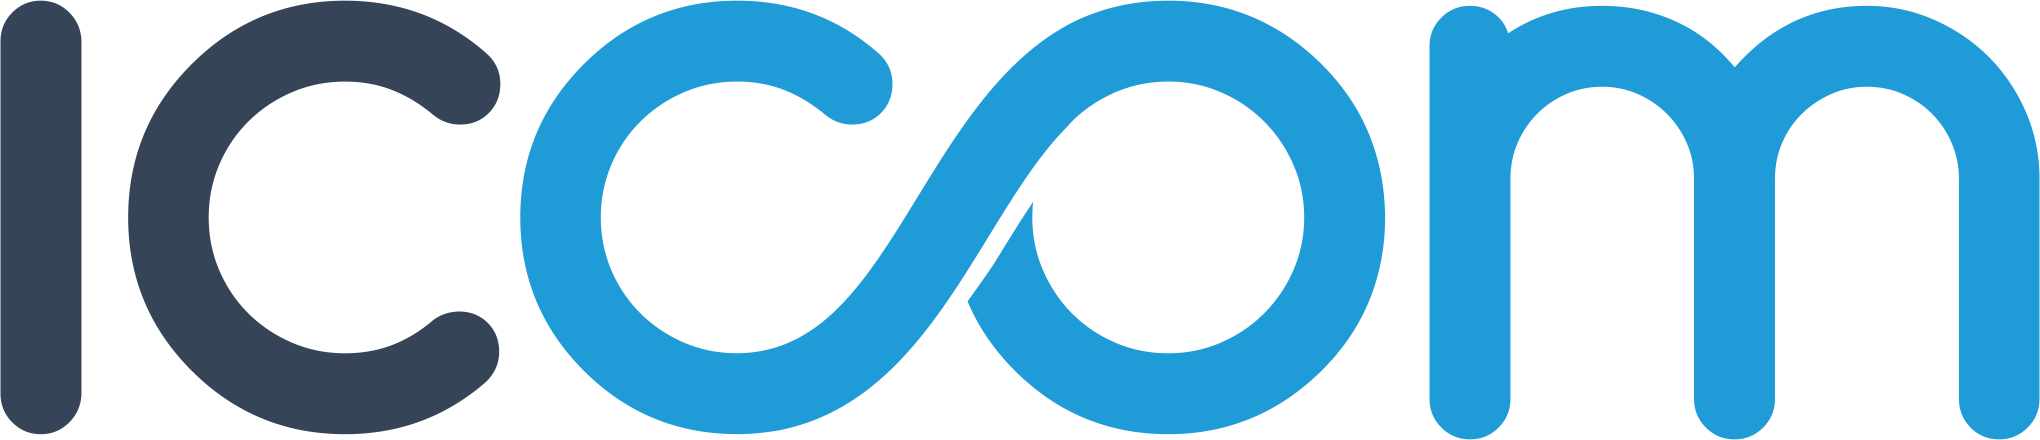 2016_ICcom_logo_web